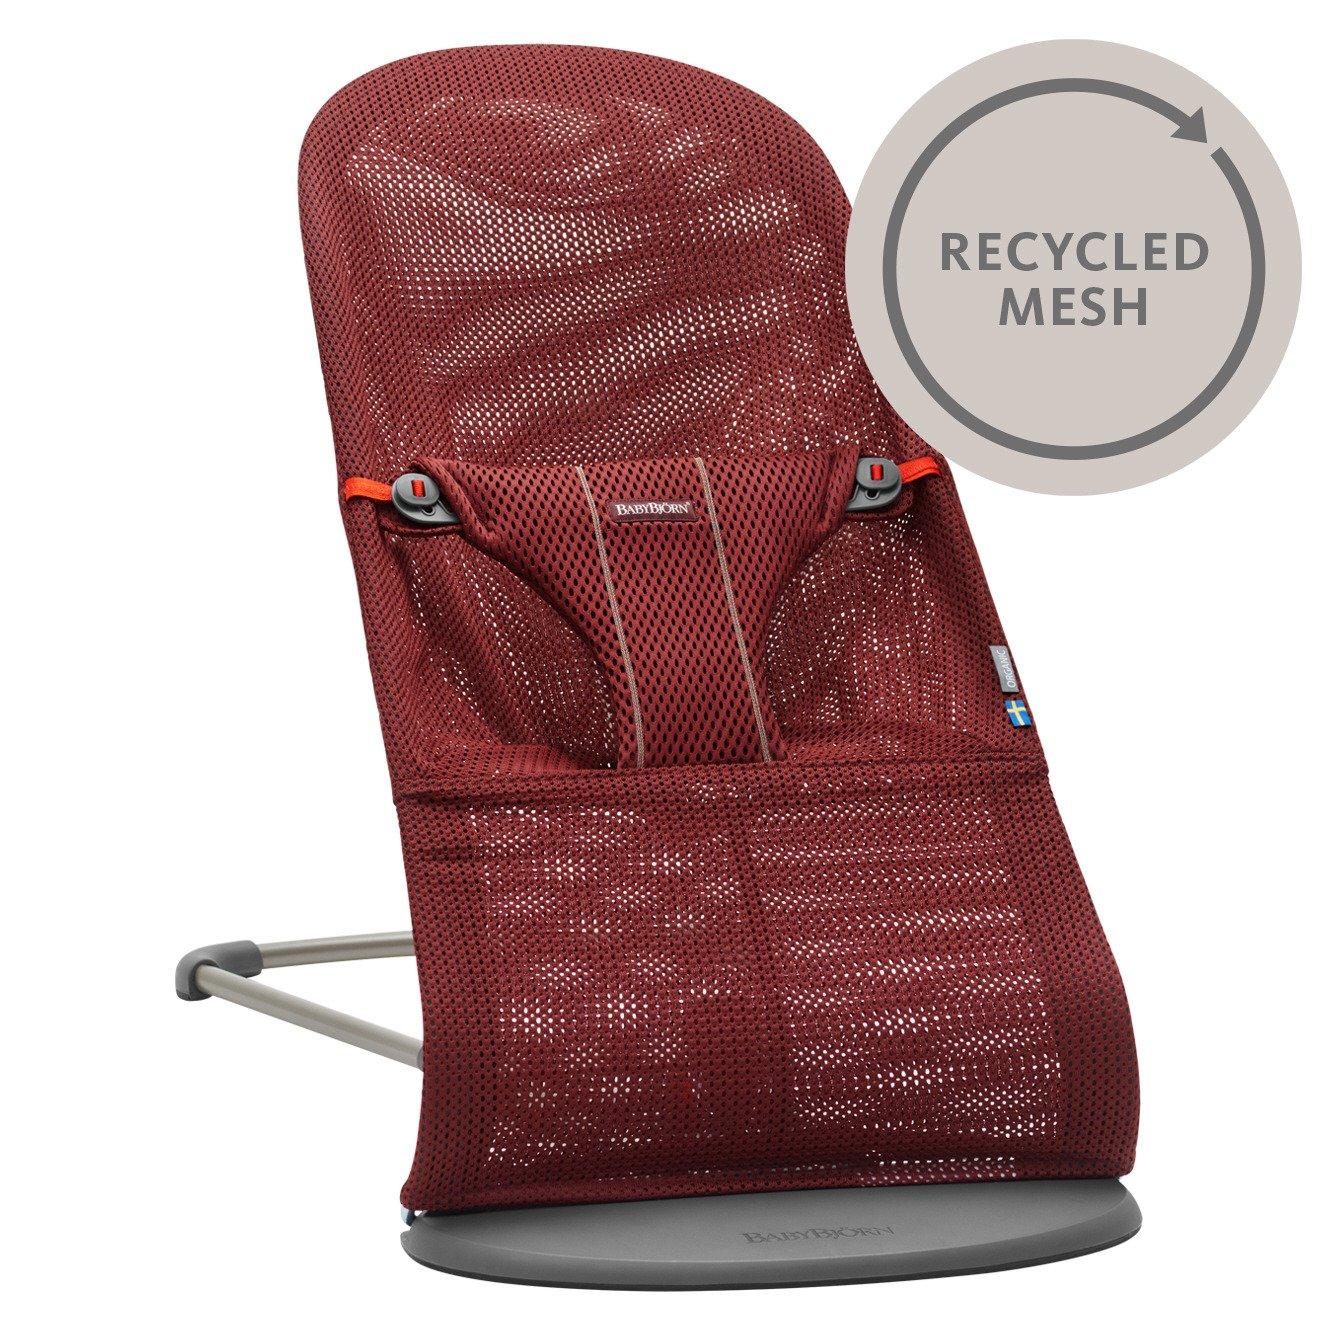 BABYBJORN - leżaczek BLISS MESH - Burgundy Recycled Mesh